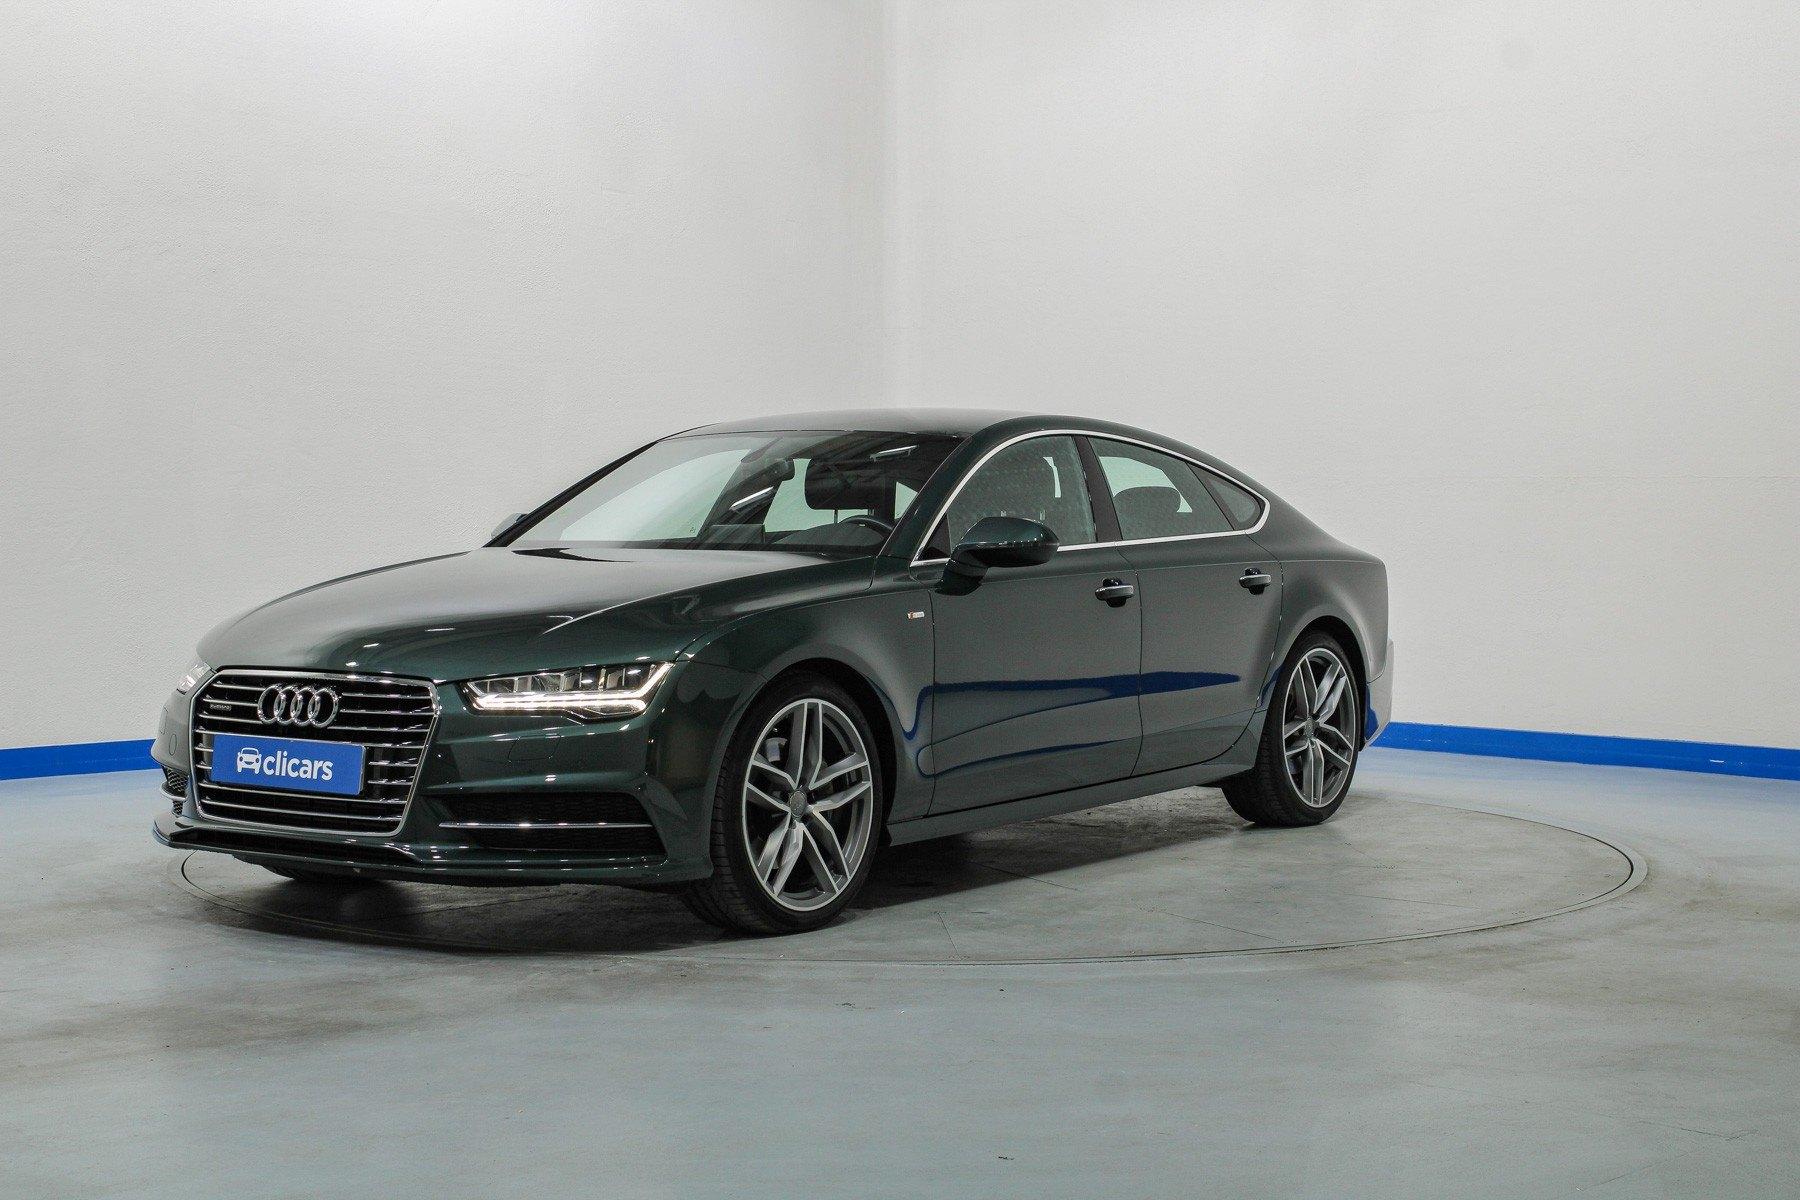 Audi A7 Diésel Sportback 3.0 TDI 272 quat S tron S line 1